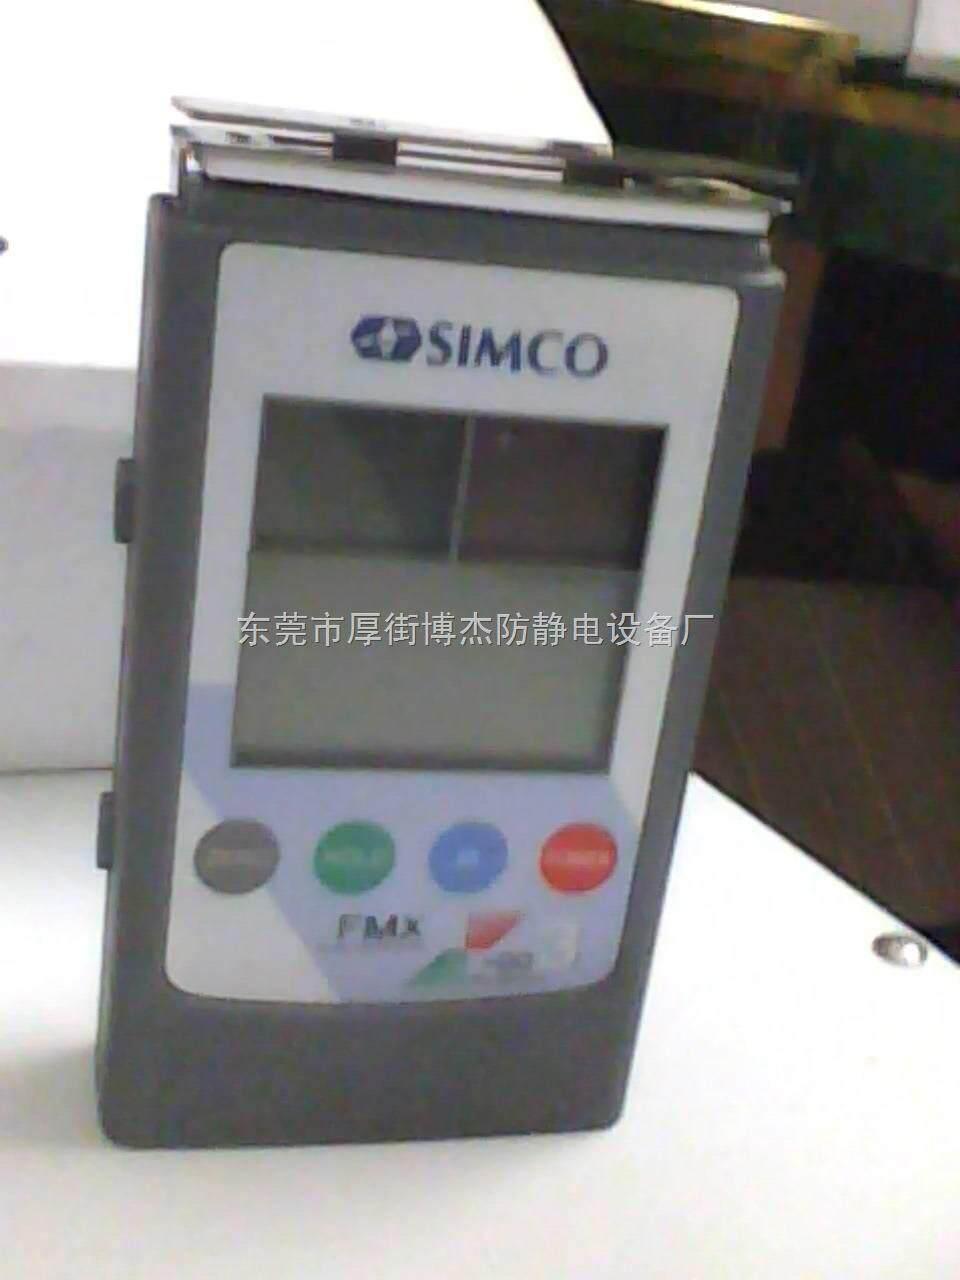 simco fmx-003静电测试仪